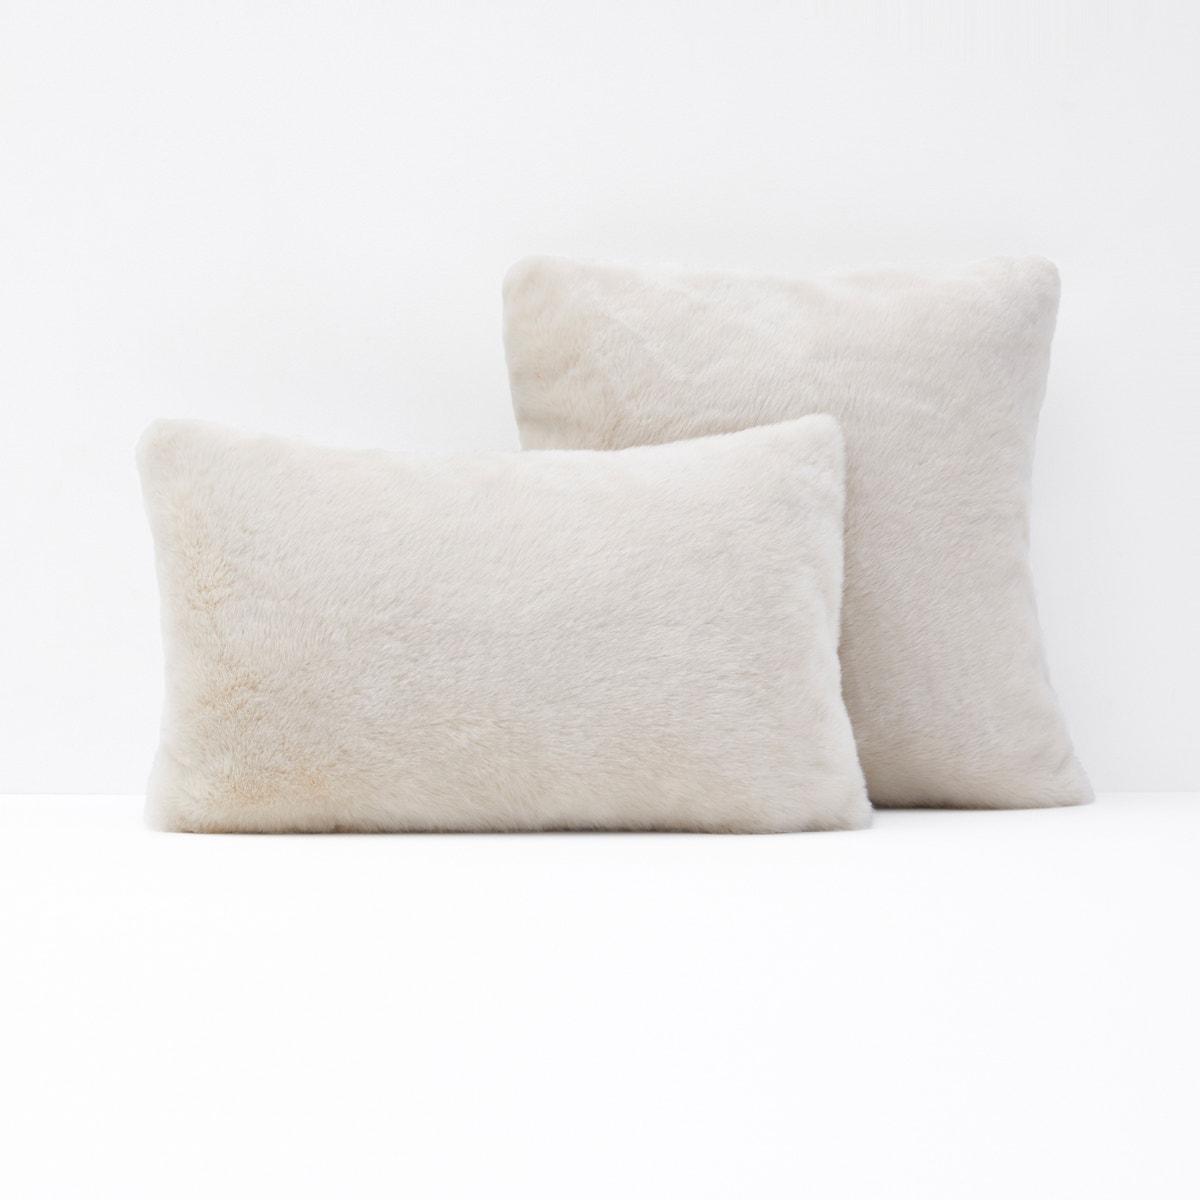 KANPUR Furry Cushion Cover